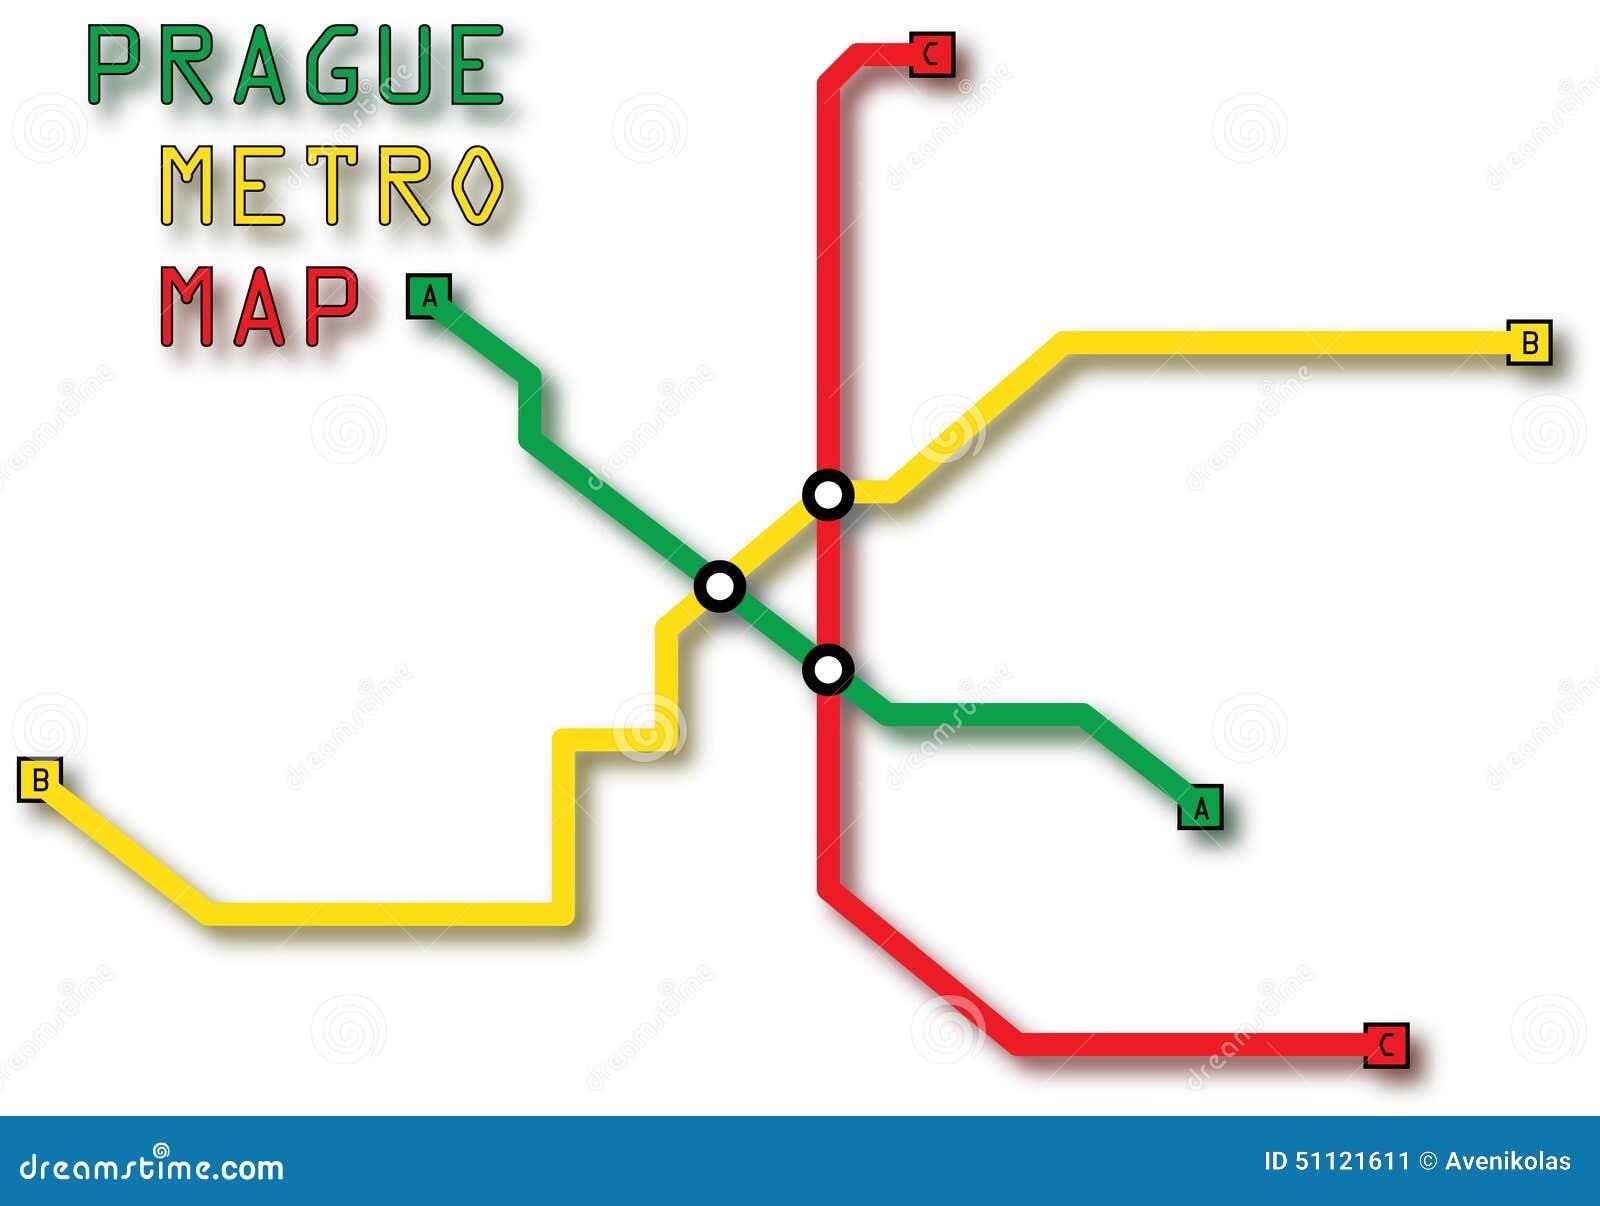 Prague Metro Map Stock Image Image Of Colors Words 51121611